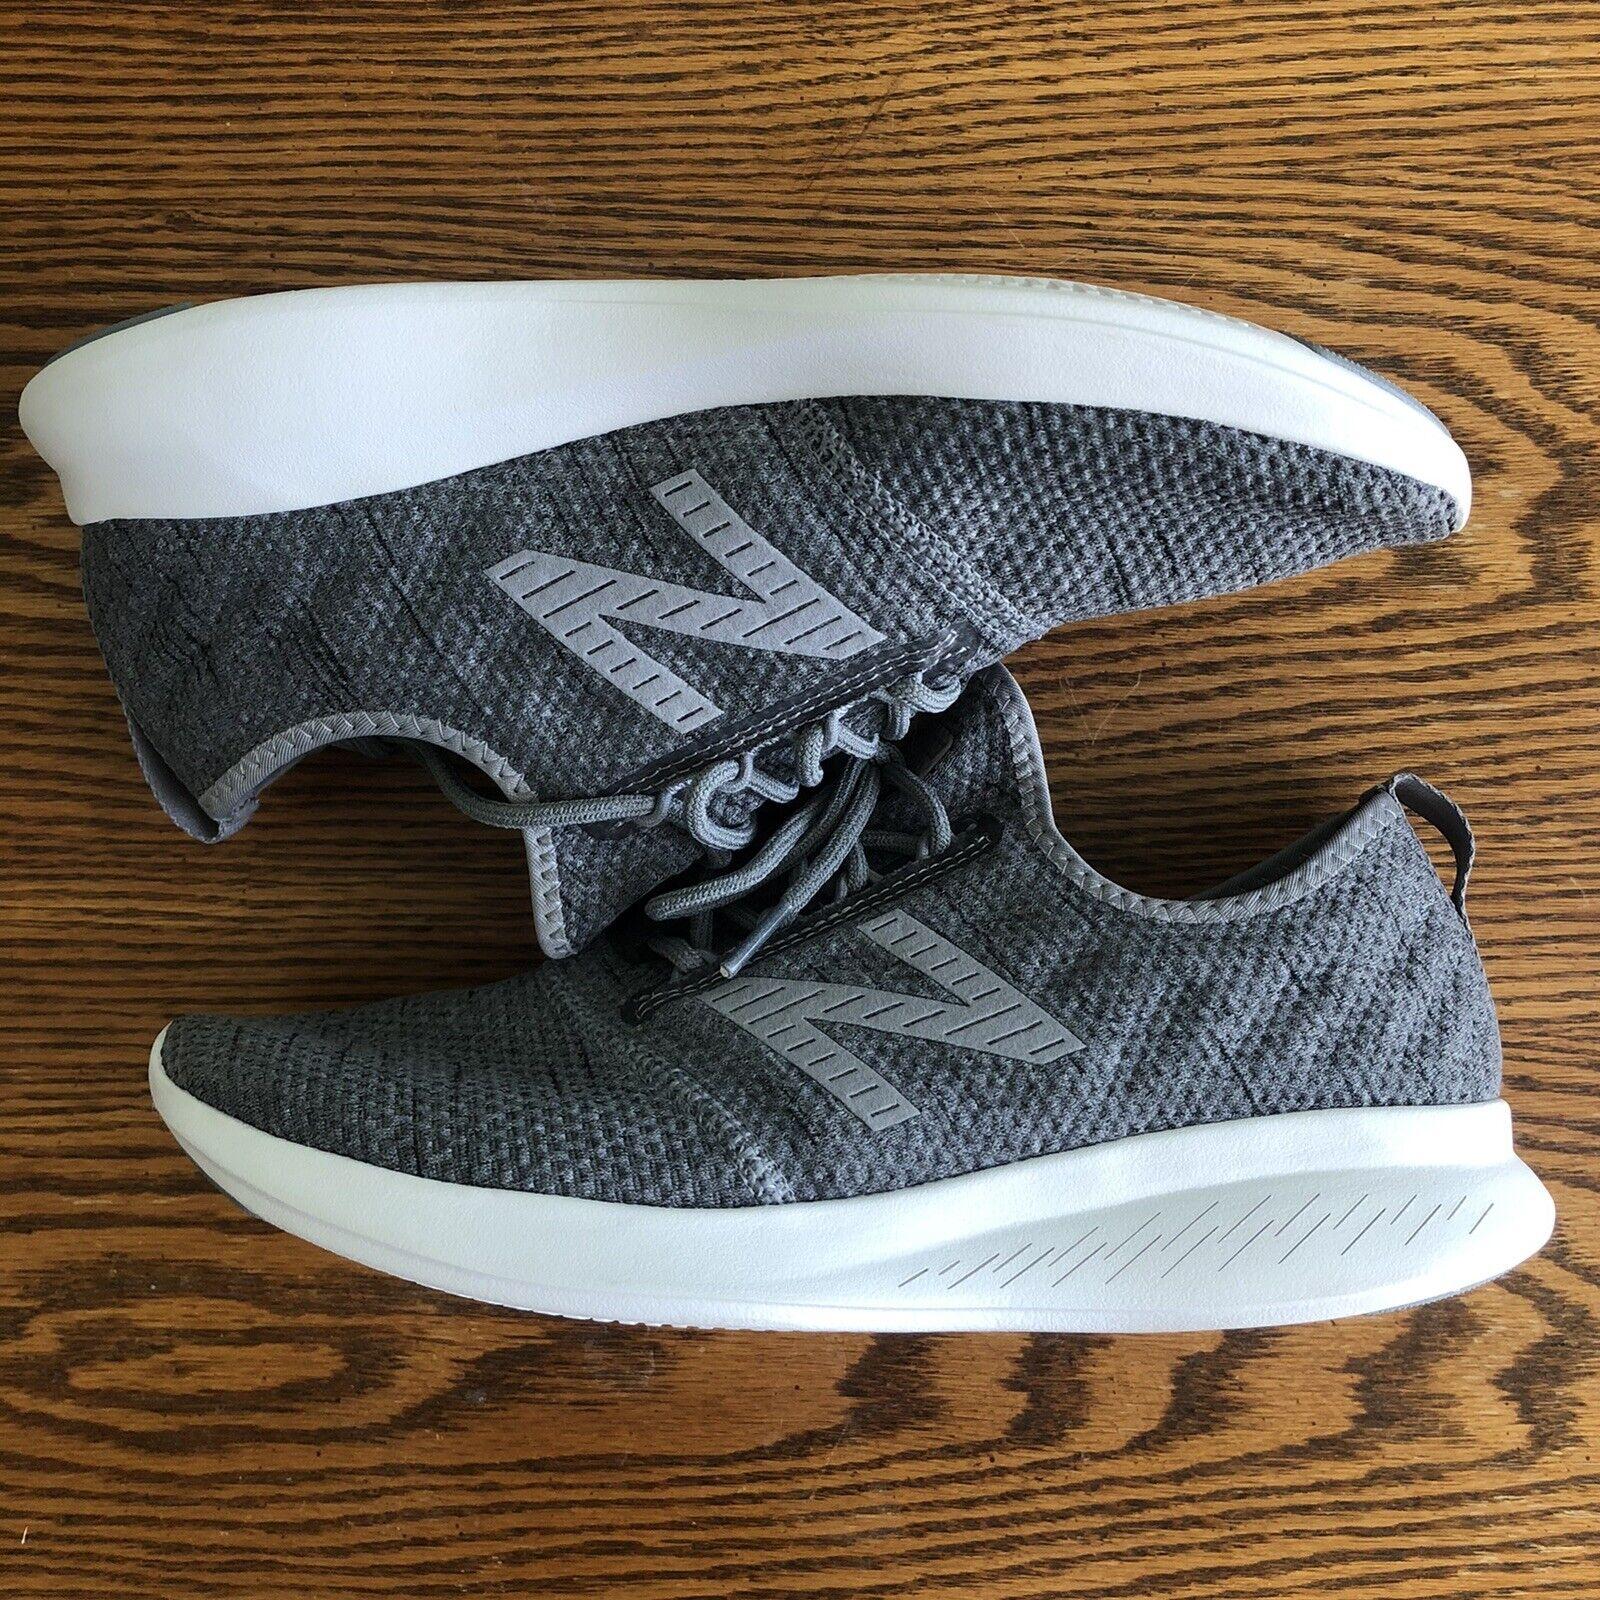 Coast V4 Fuelcore Athletic Shoe Running